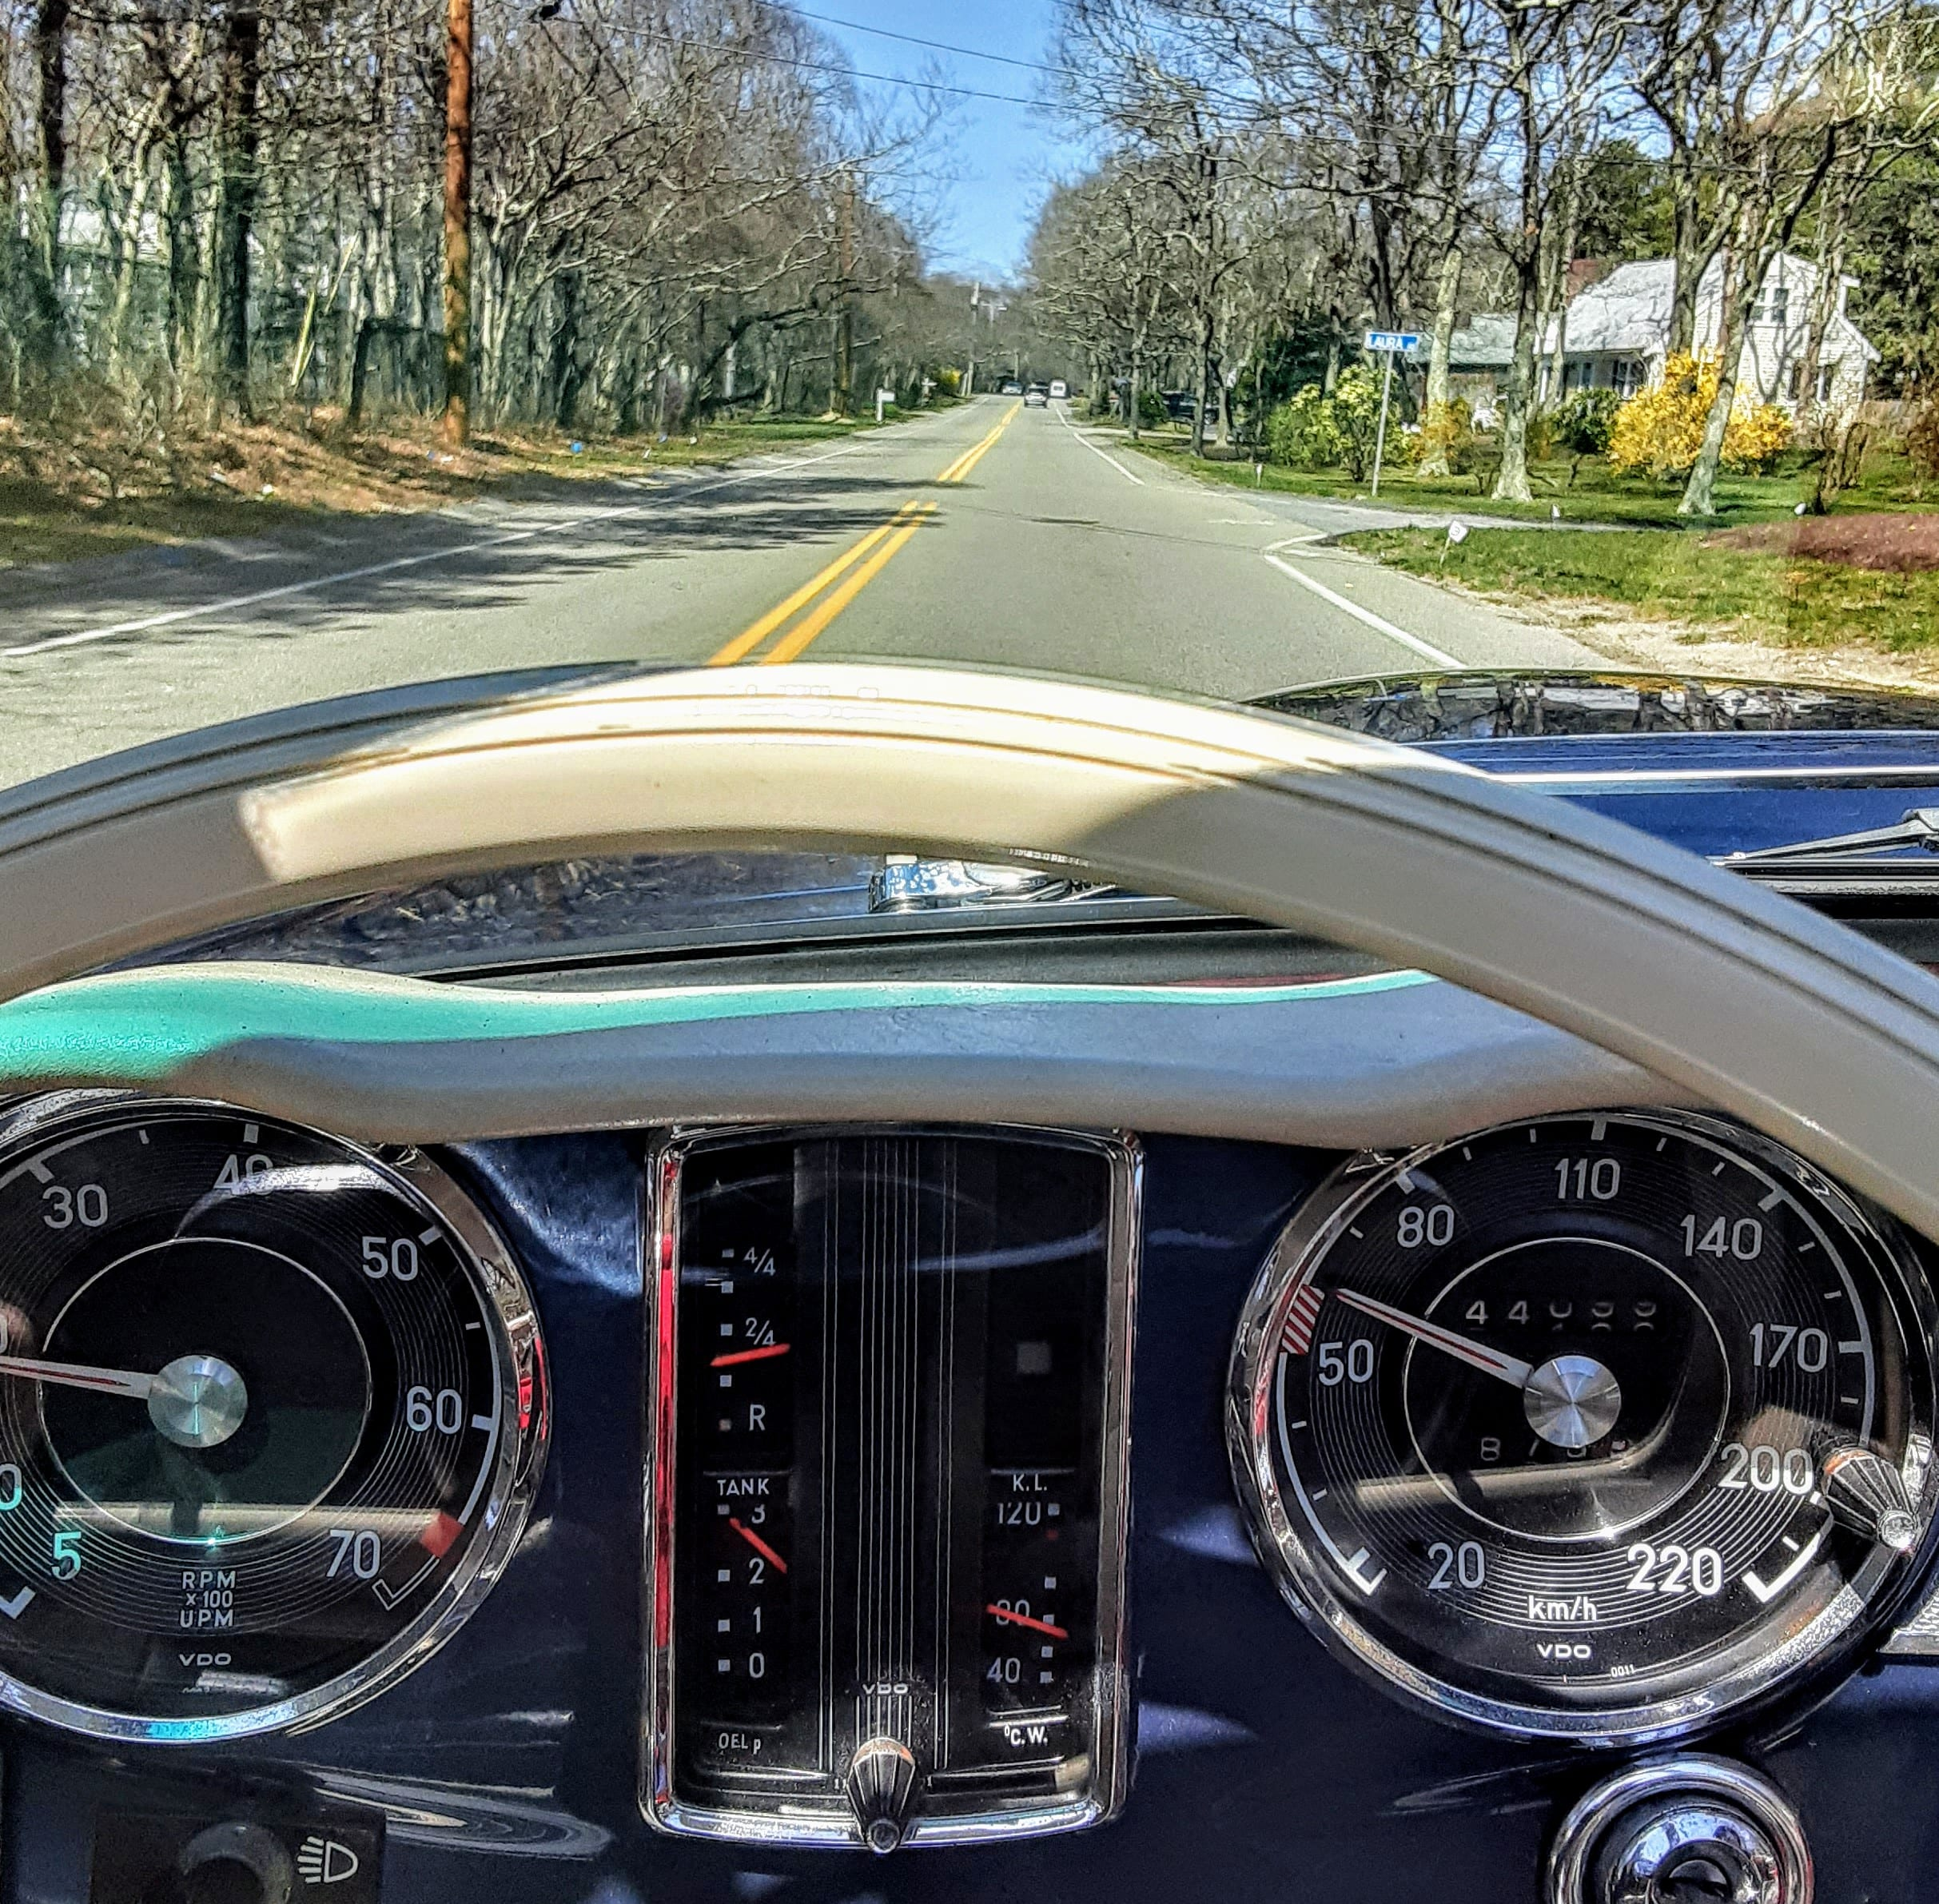 A vintage car drives down 6A